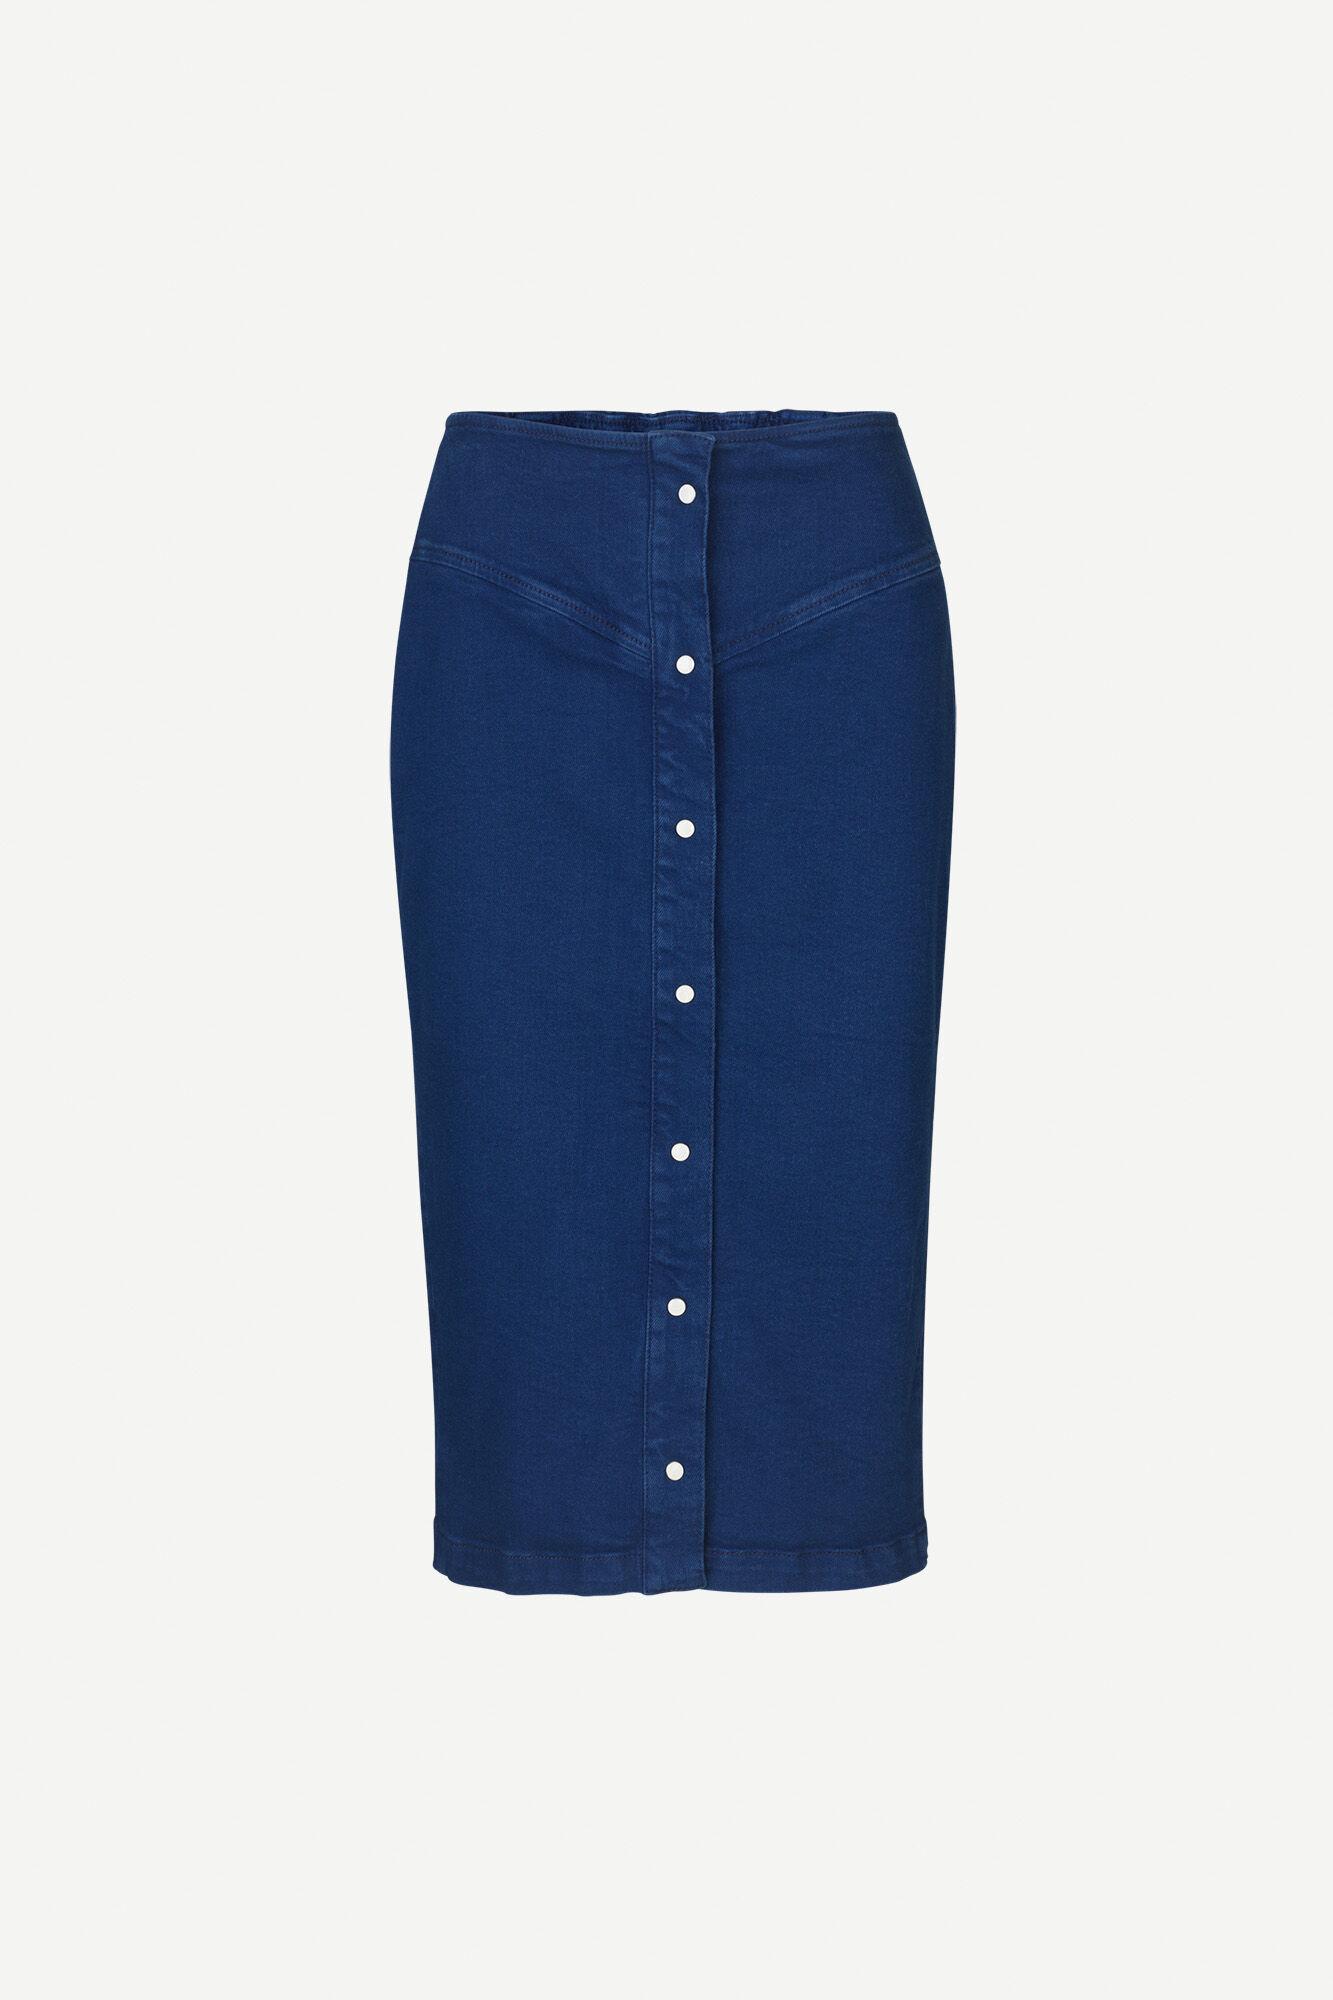 Bertha long skirt 11492, INDIGO BLUE